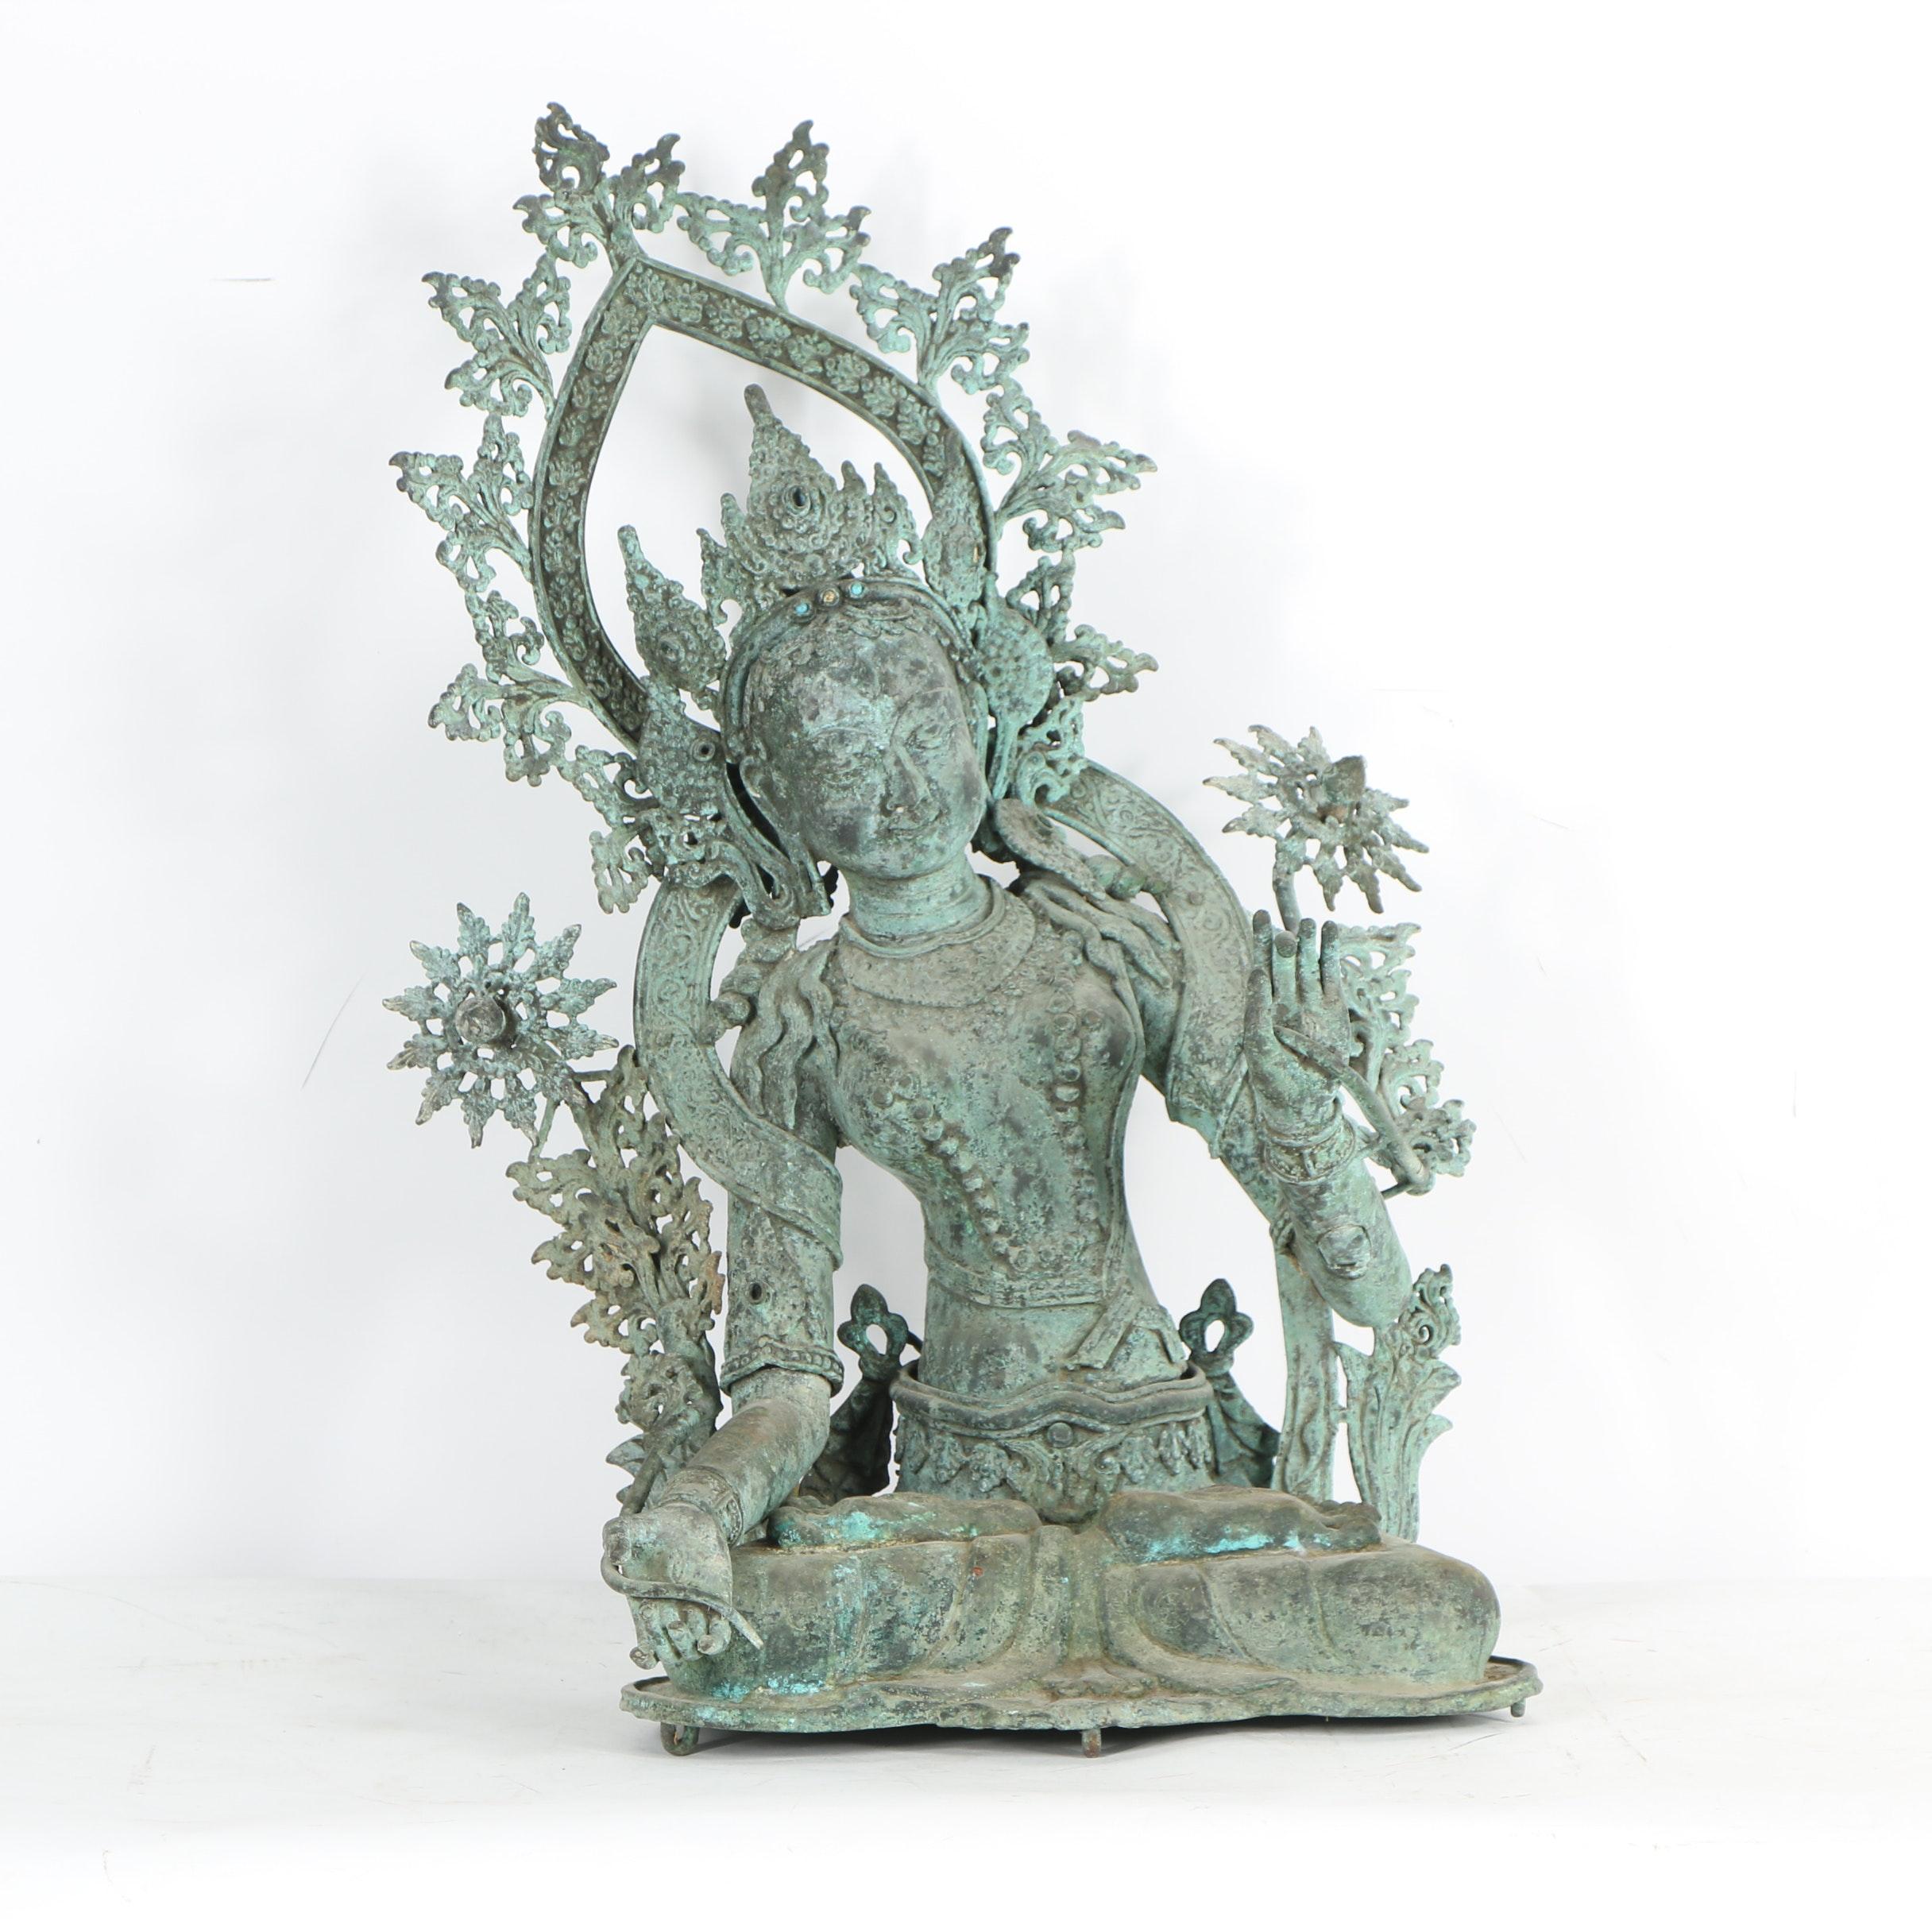 Tibetan Style Cast Metal Tara Sculpture